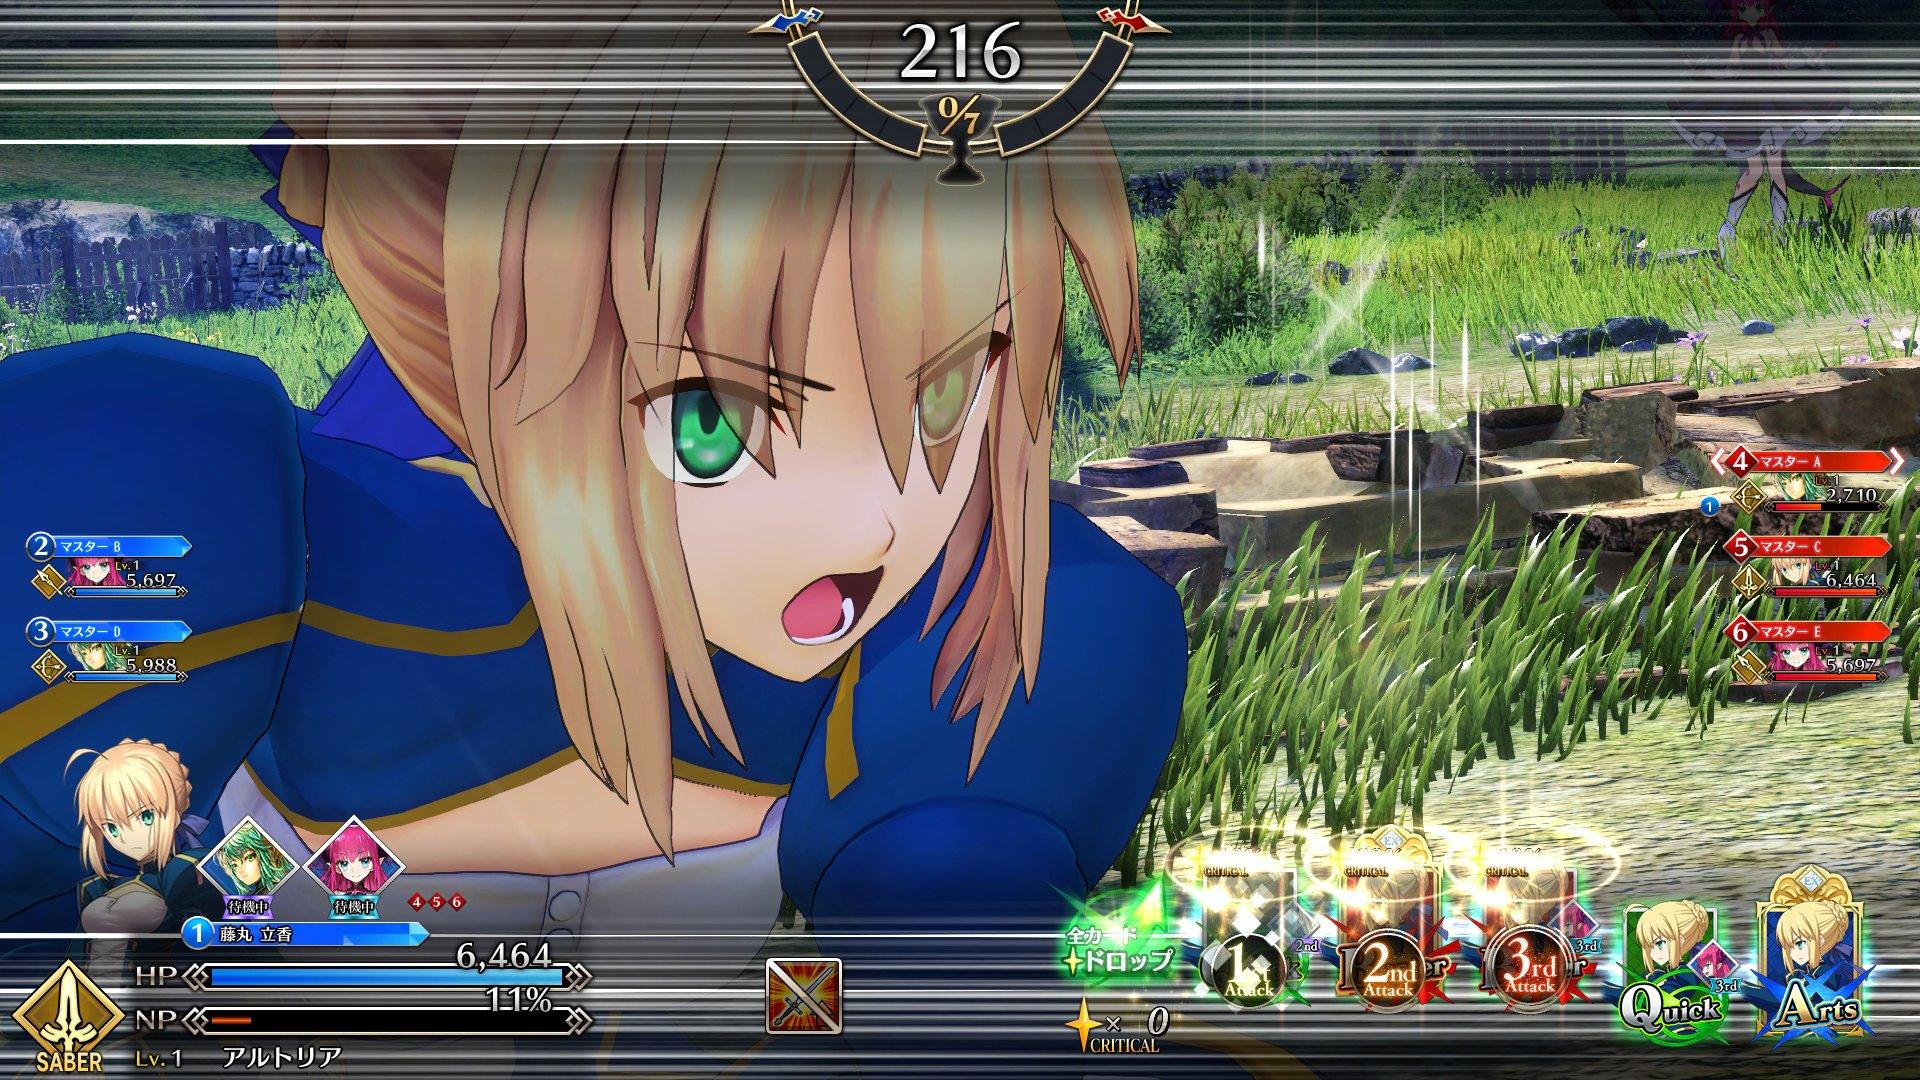 Fate-Grand-Order-Arcade_2017_12-07-17_004